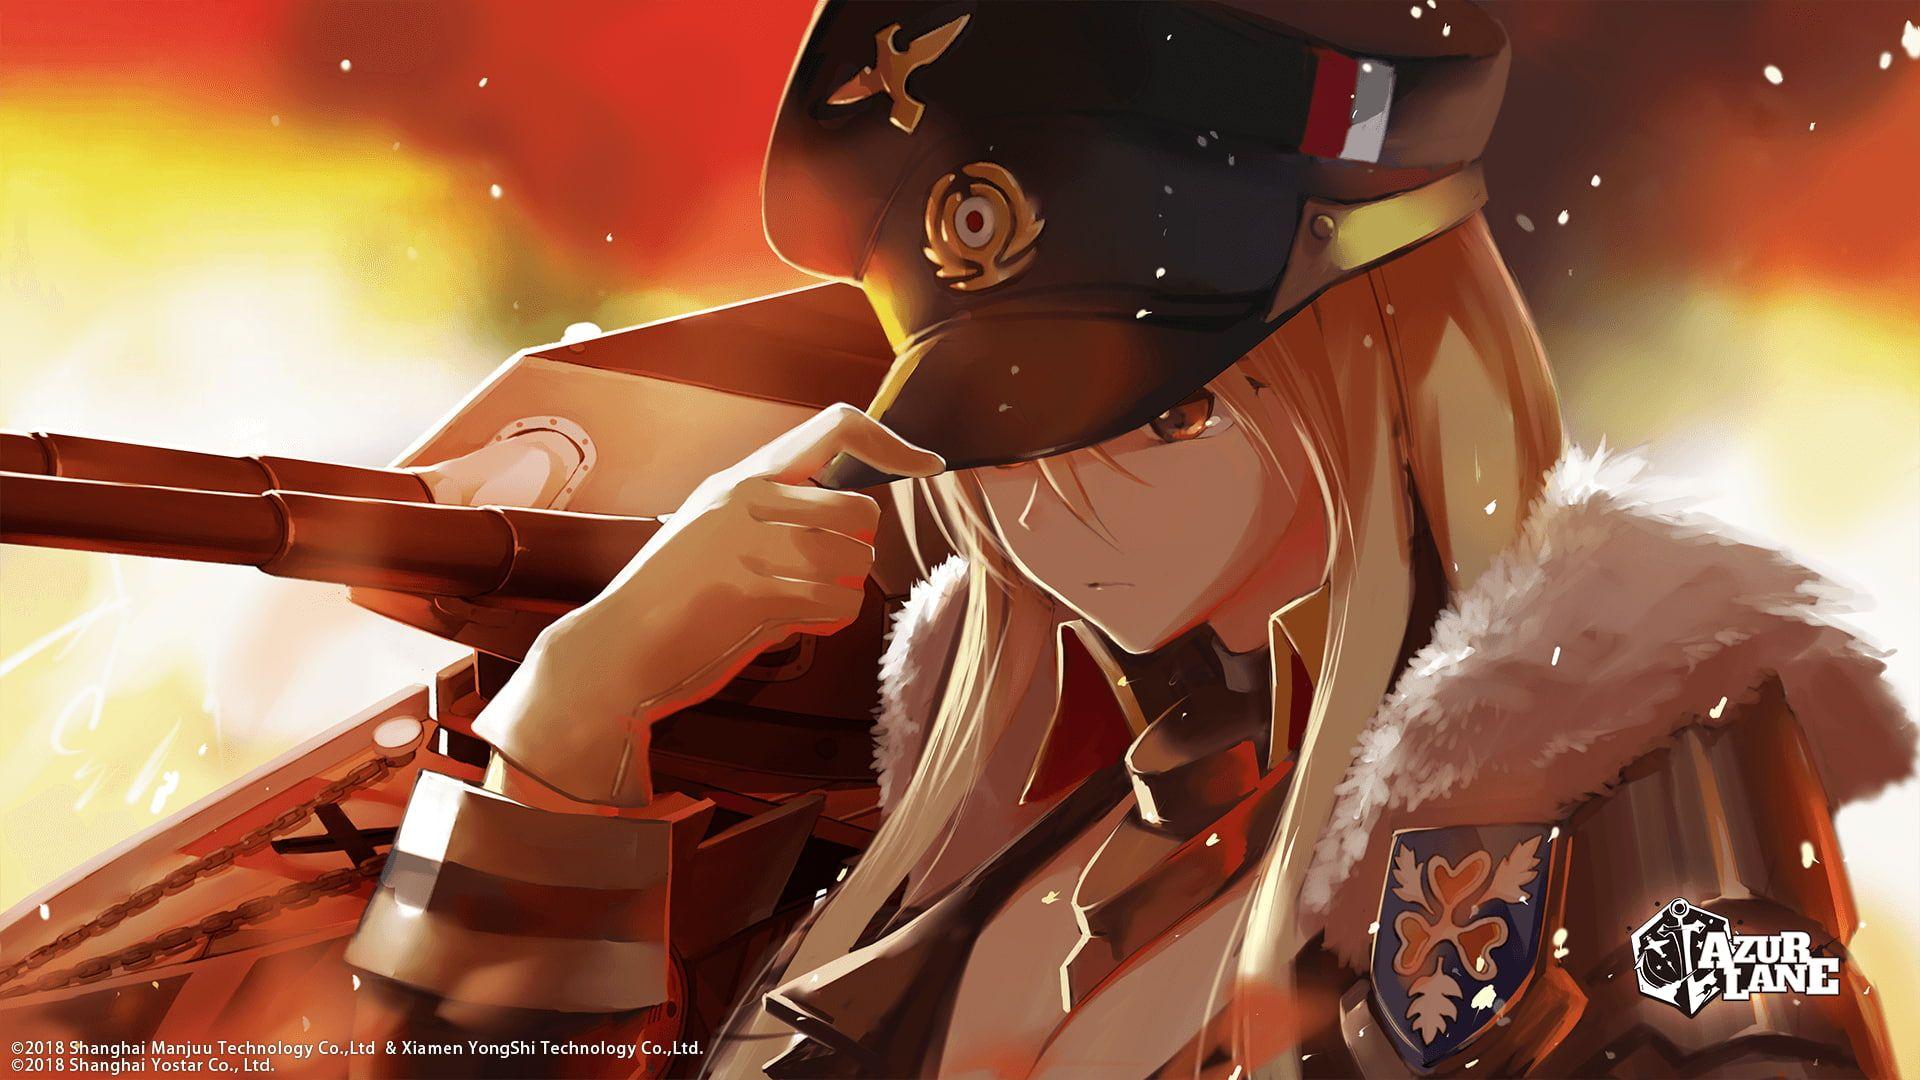 Video Game Azur Lane Anime Bismarck Azur Lane 1080p Wallpaper Hdwallpaper Desktop Hipster Pictures Anime Background Images